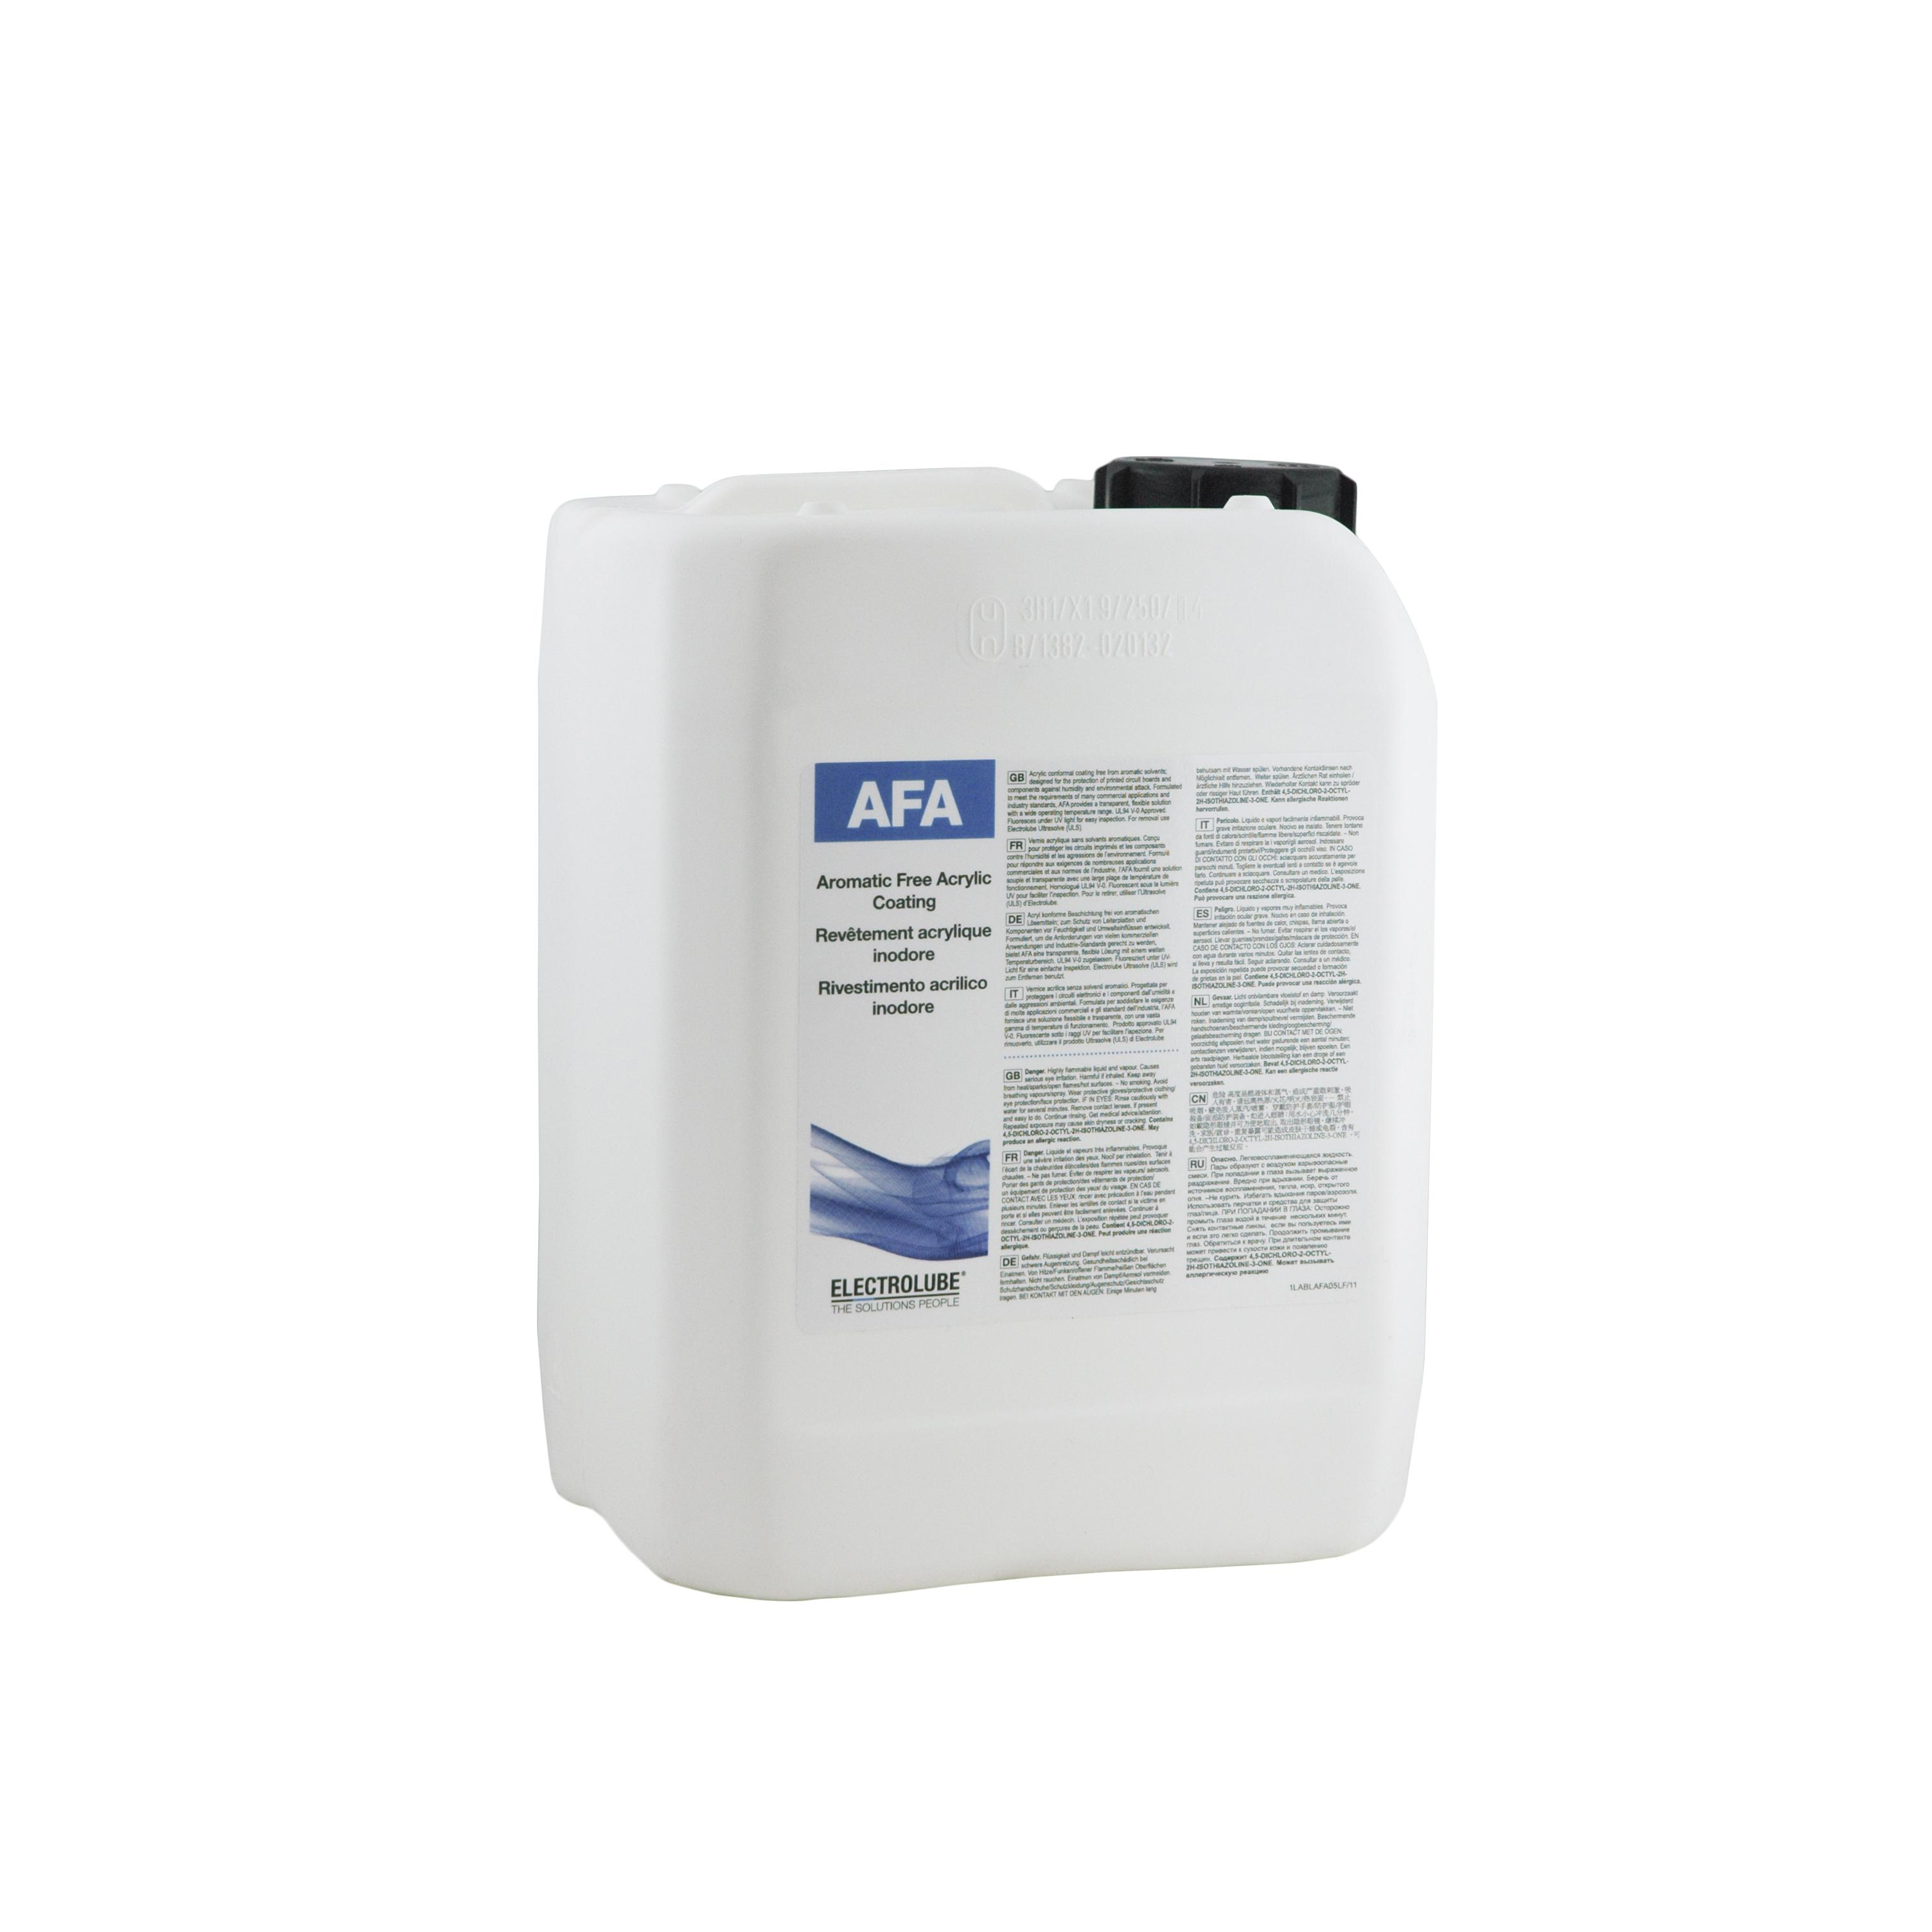 Electrolube Afa05l Aromatic Free Acrylic Coating 5l